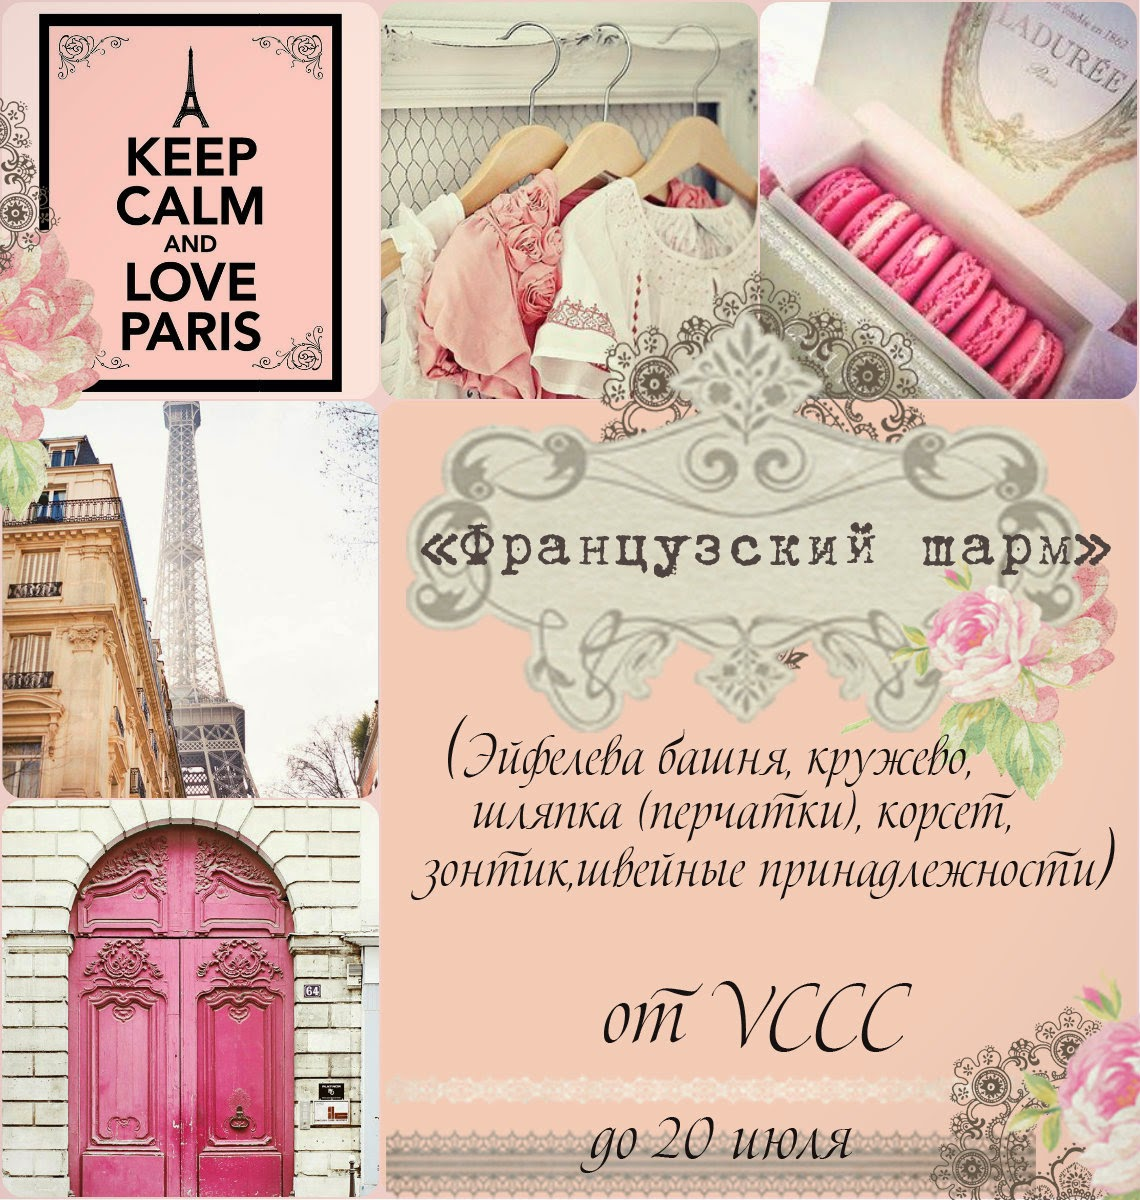 http://vintagecafecard.blogspot.ru/2014/07/blog-post.html